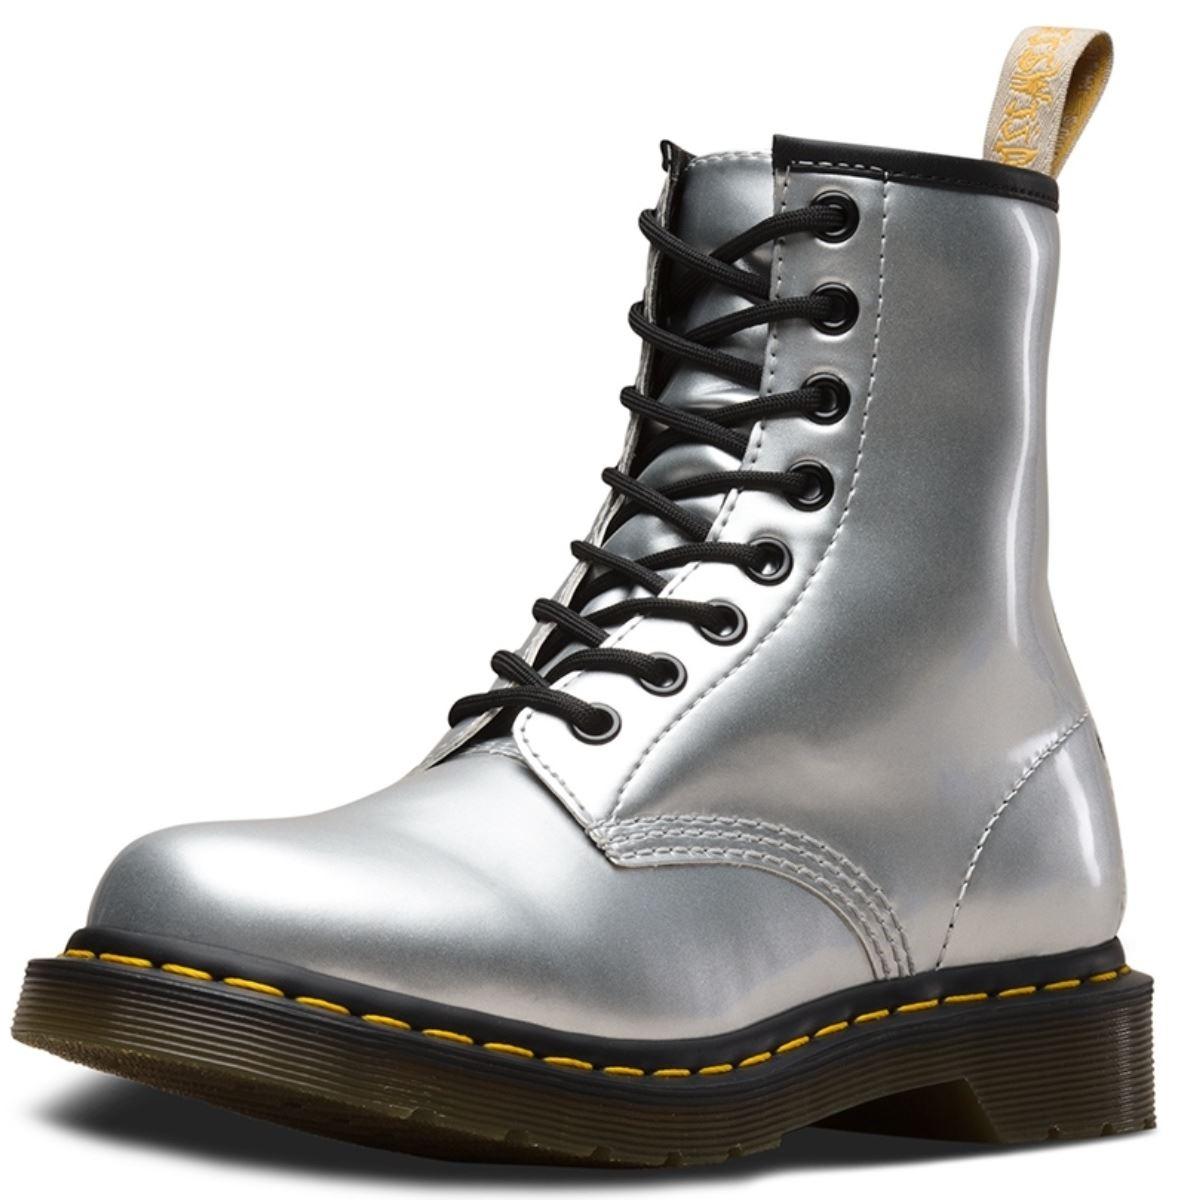 Dr Martens 1460 Vegan Silver Chrome Paint Metallic 8 eyelets Womens Boots